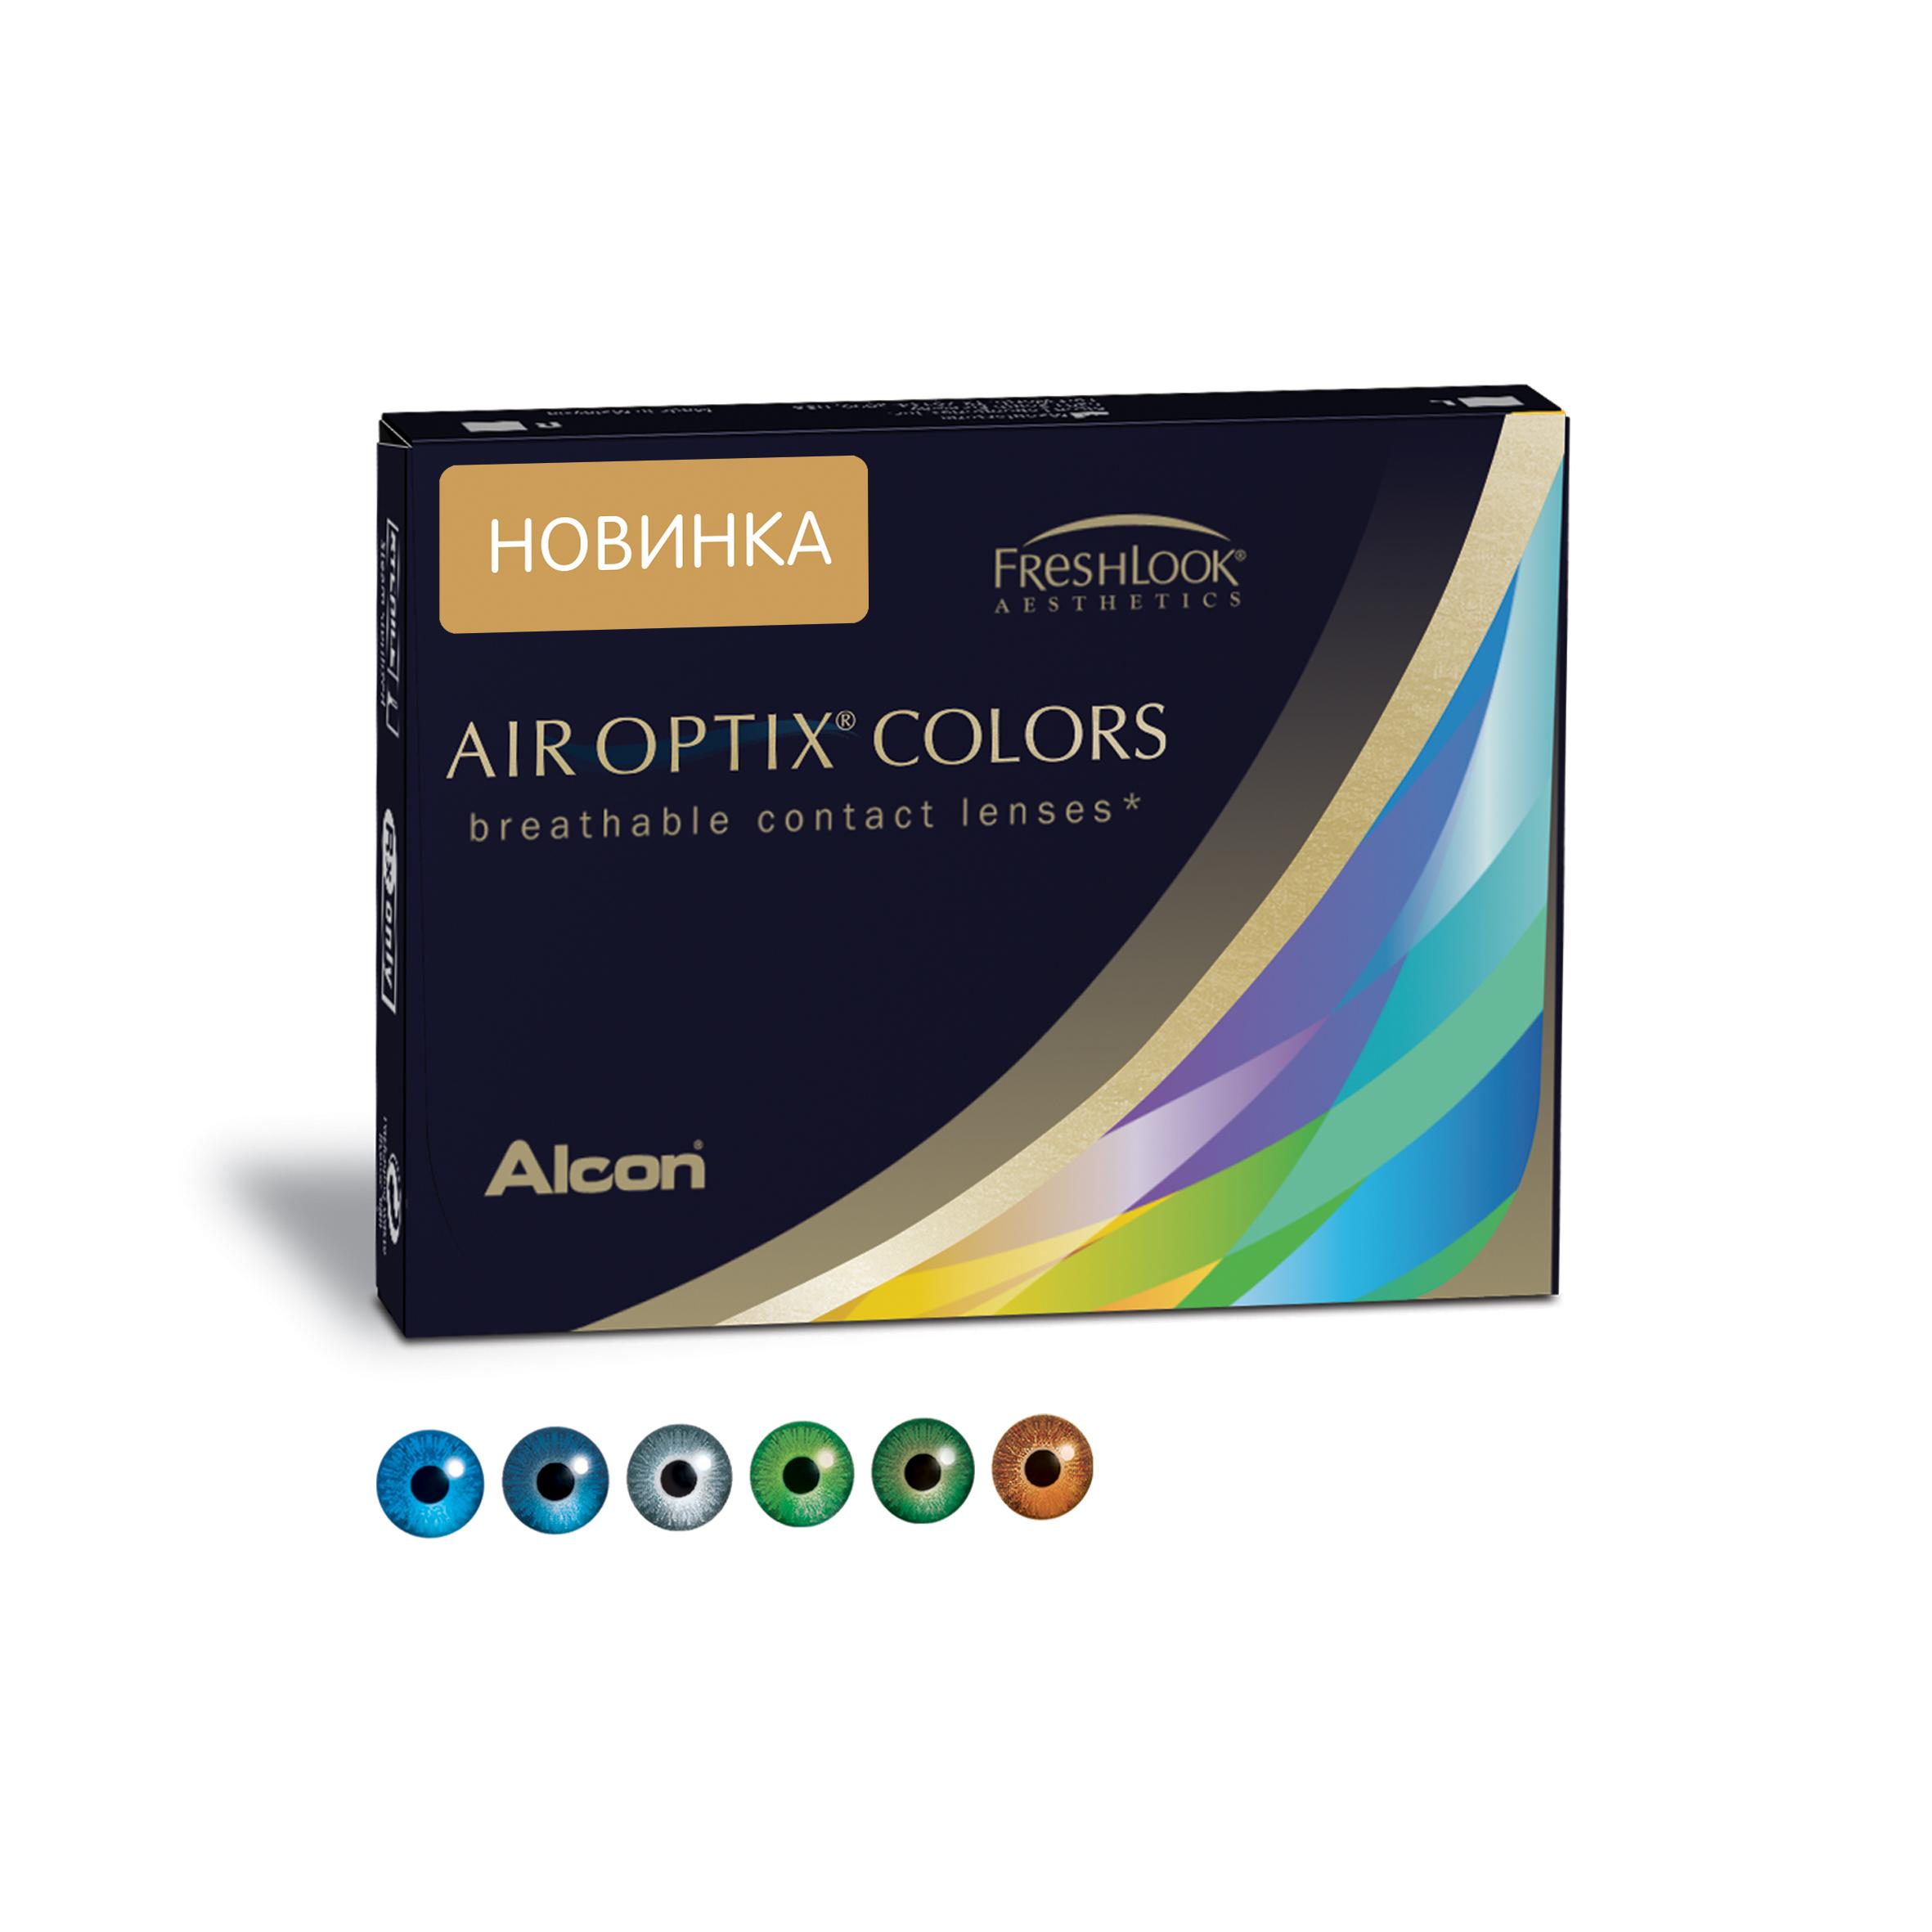 Аlcon контактные линзы Air Optix Colors 2 шт -1.25 Green31746135Мягкие контактные линзы